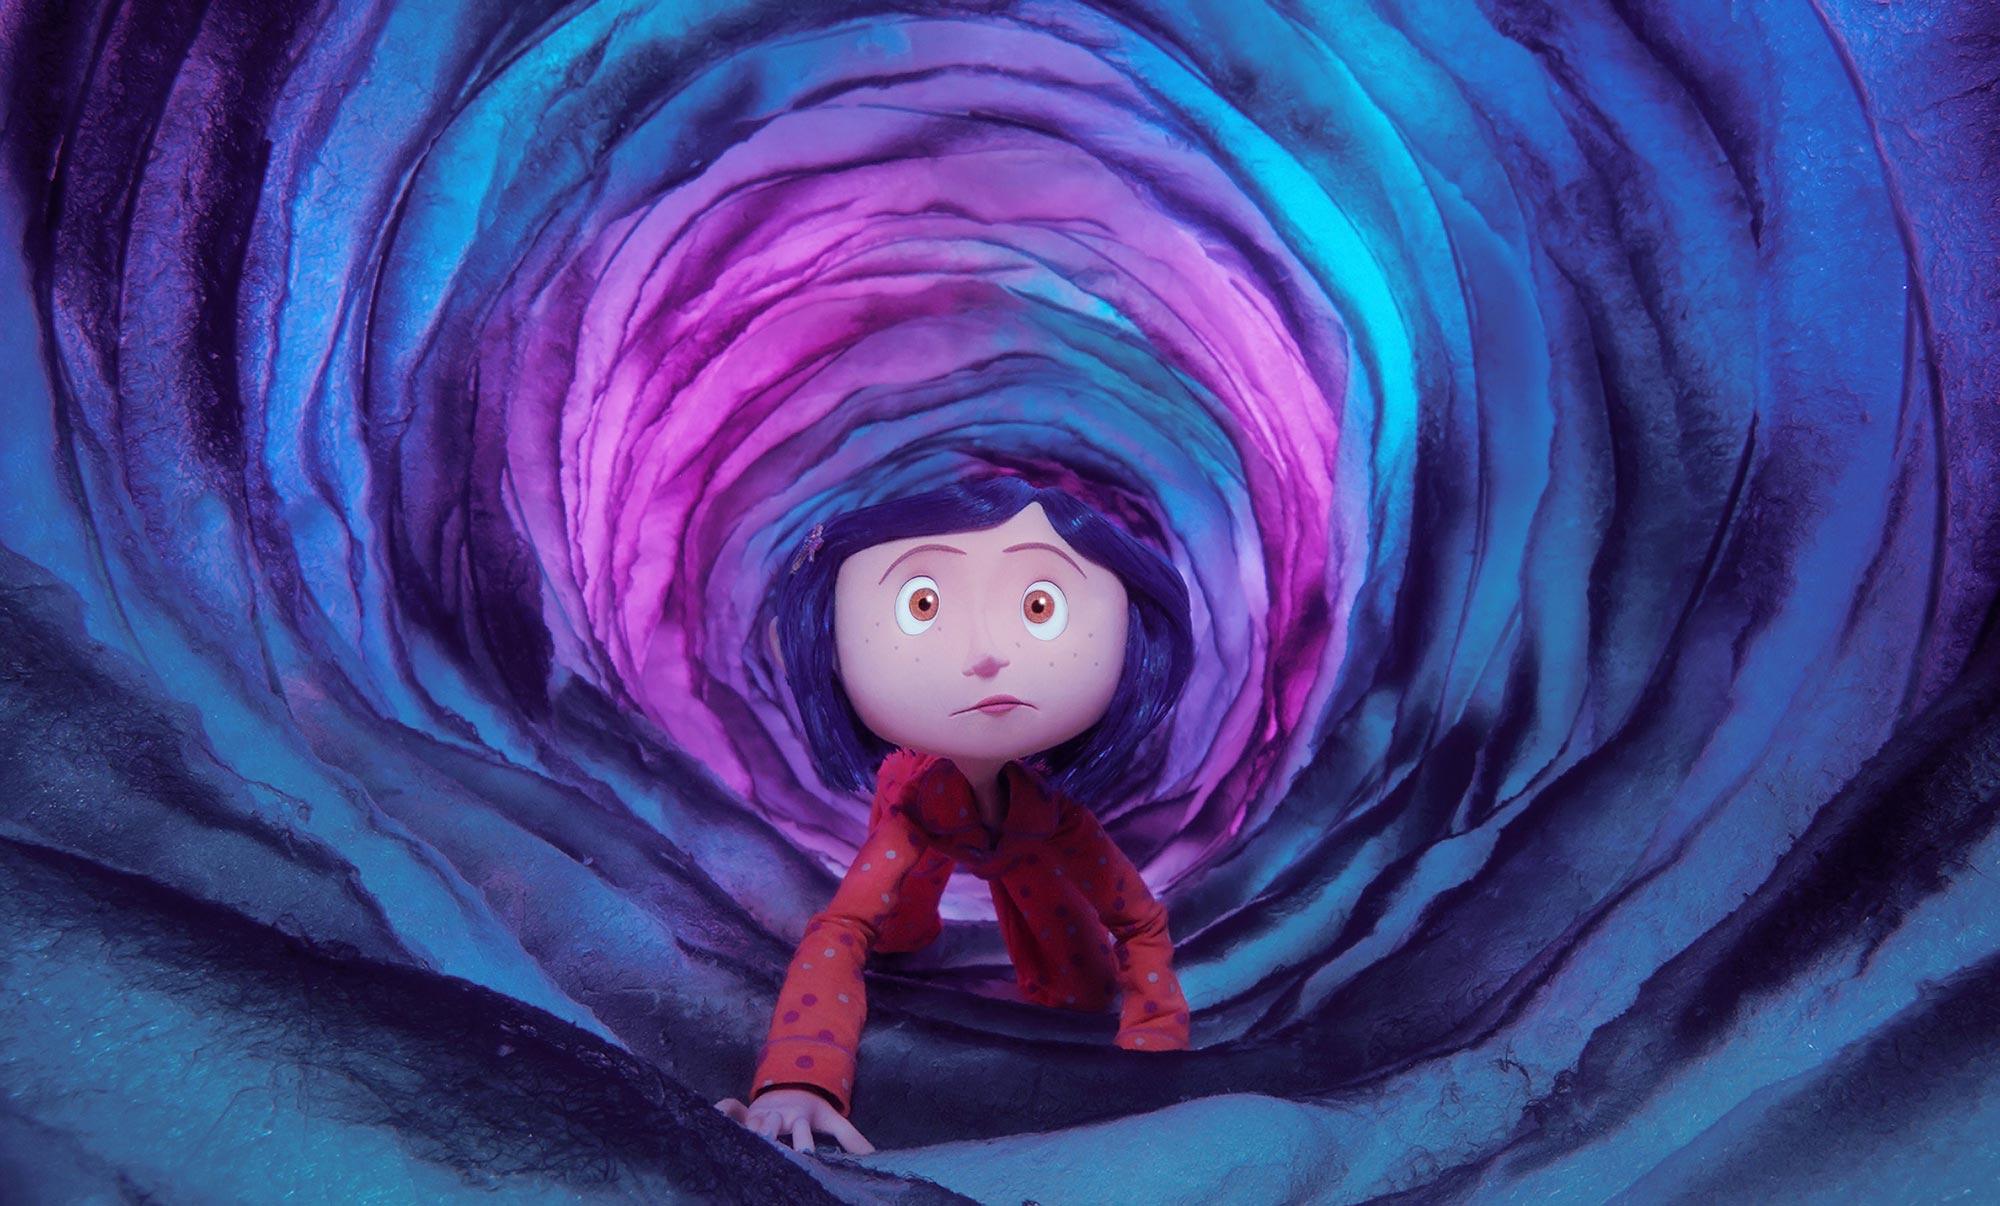 Coraline S Neil Gaiman Teri Hatcher Look Back On The Otherworldly Children S Classic Ew Com